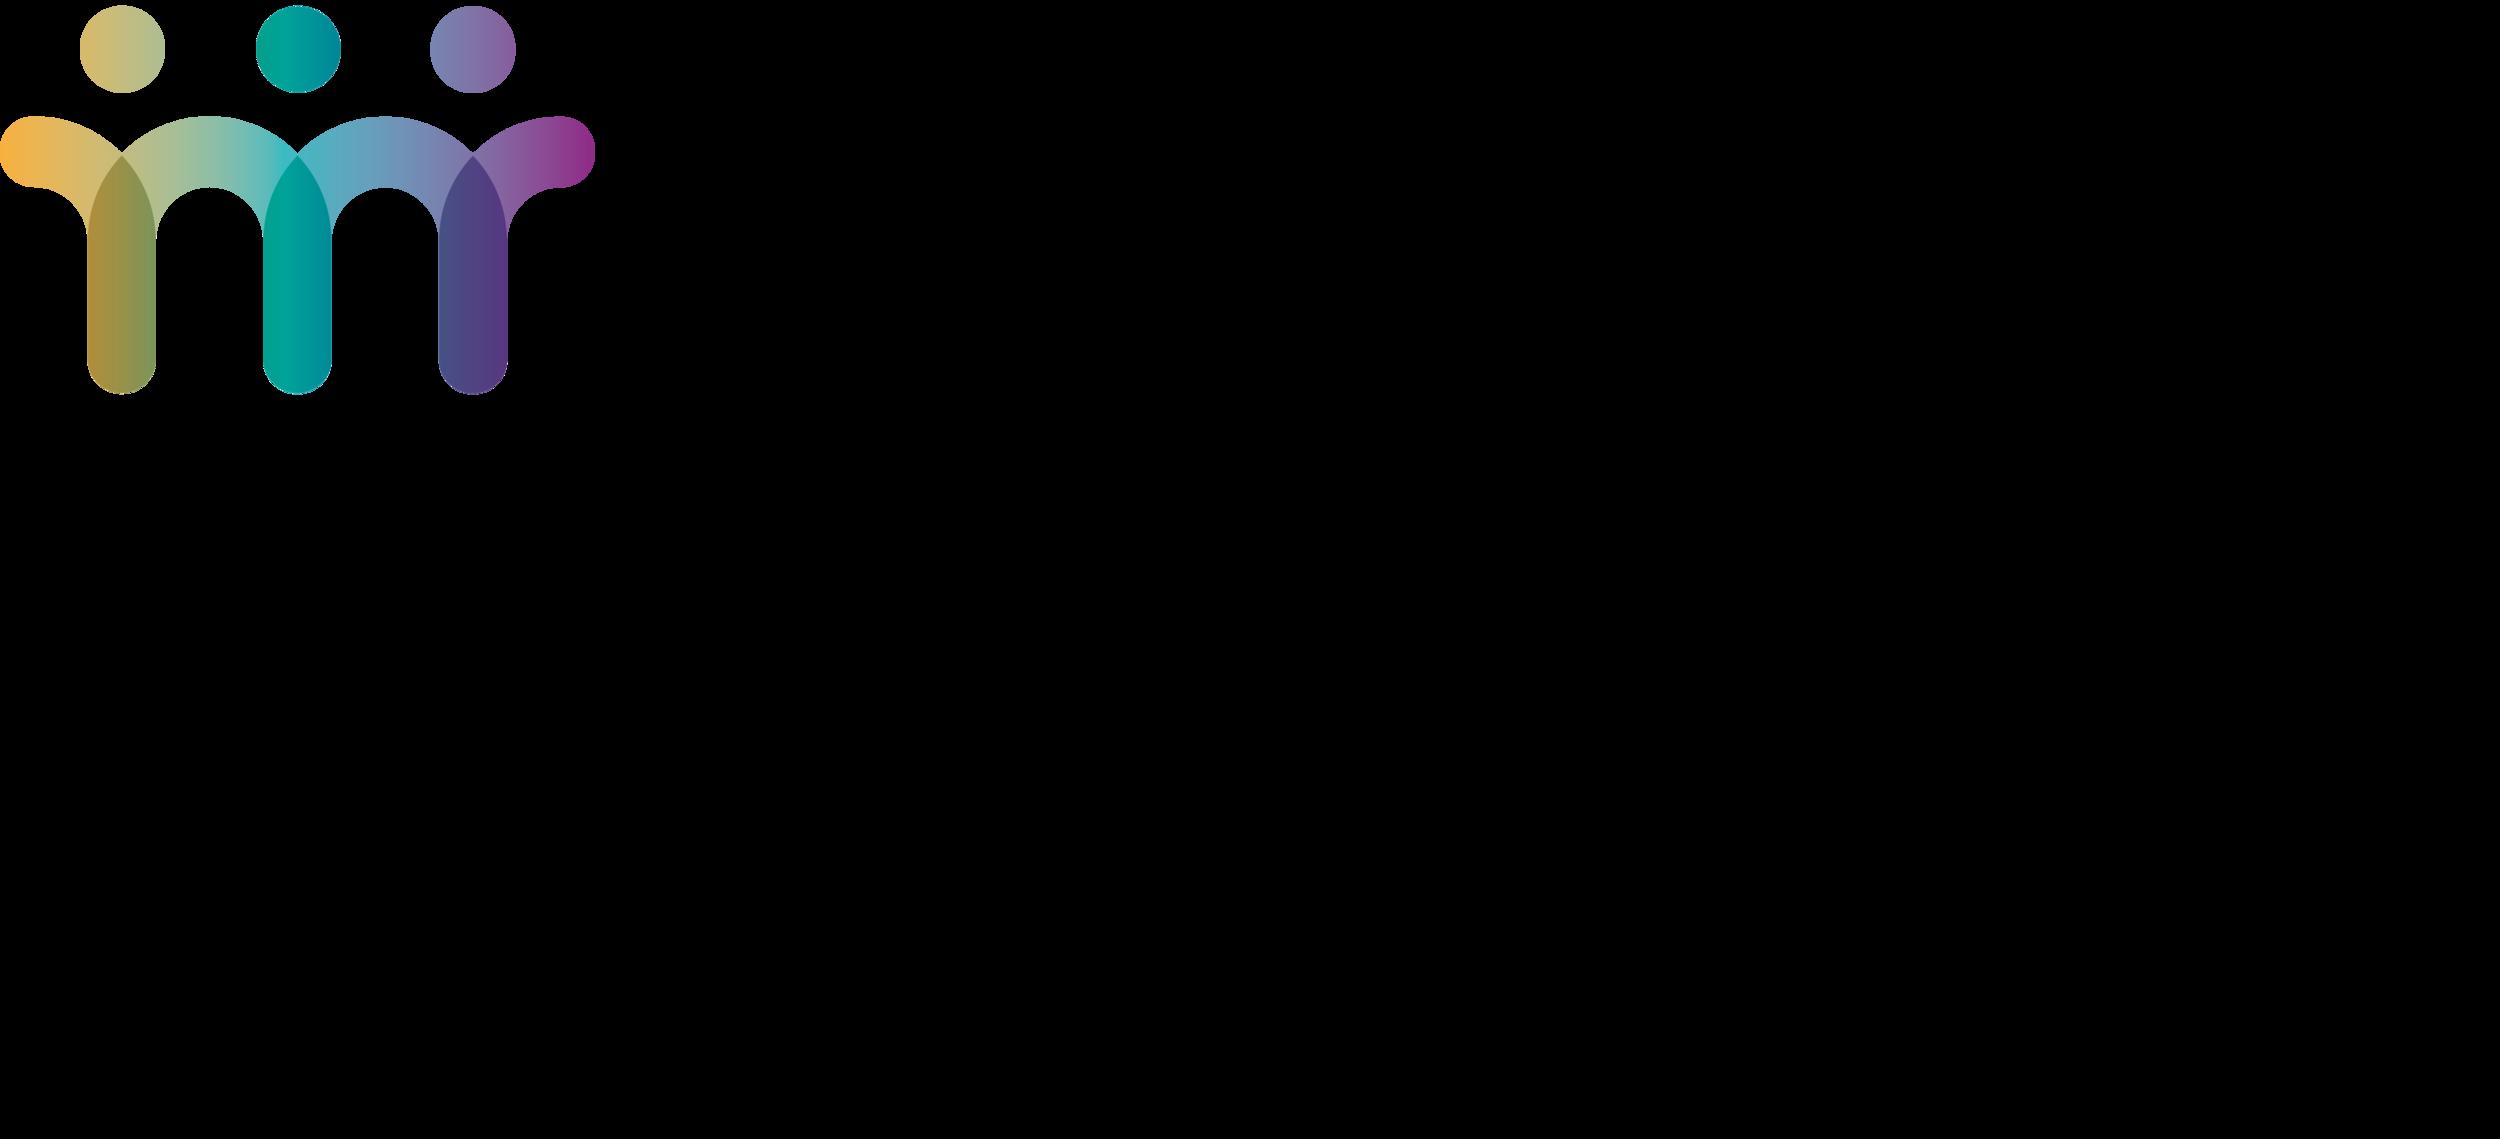 mateneen-site logo-2.png